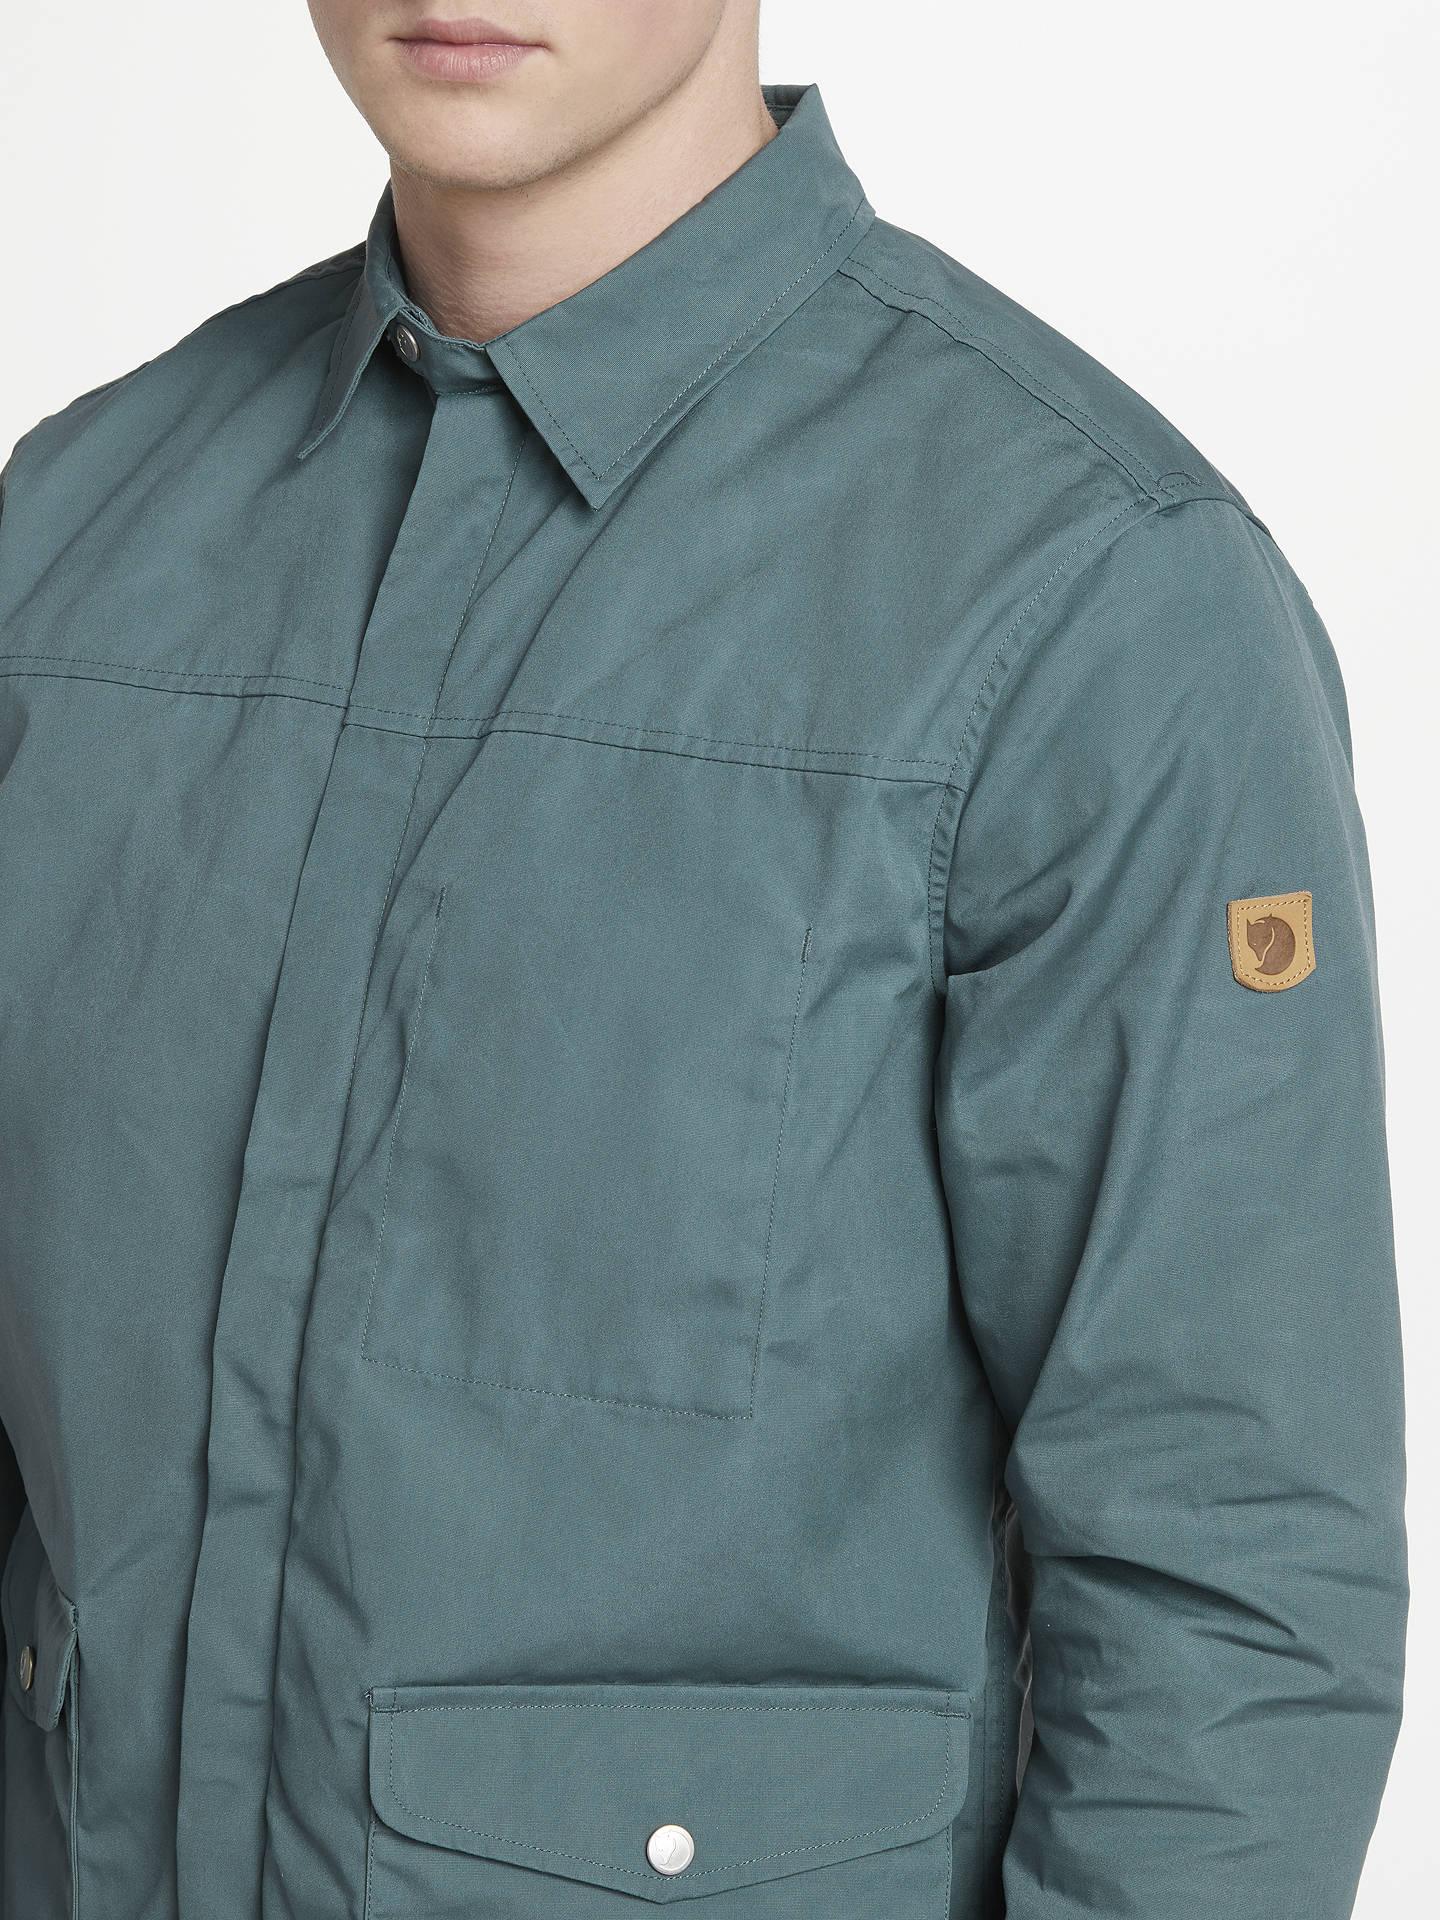 Fjllrven Greenland Jacket Dusk At John Lewis Partners Fjallraven Top Buyfjllrven S Online